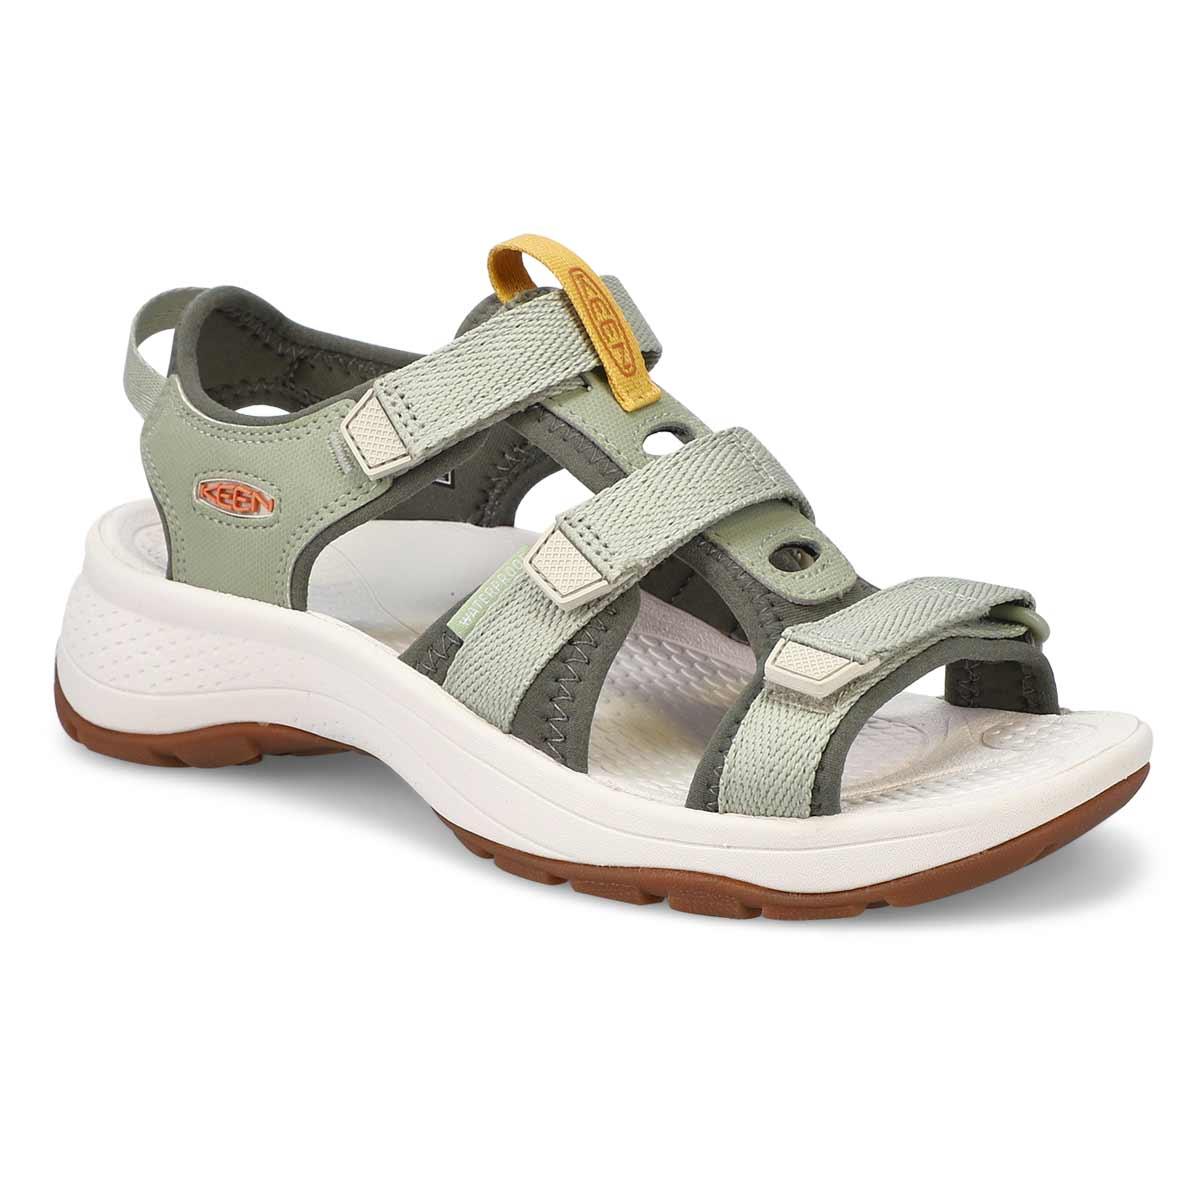 Sandale ASTORIA WEST OPEN TOE,sauge,femmes